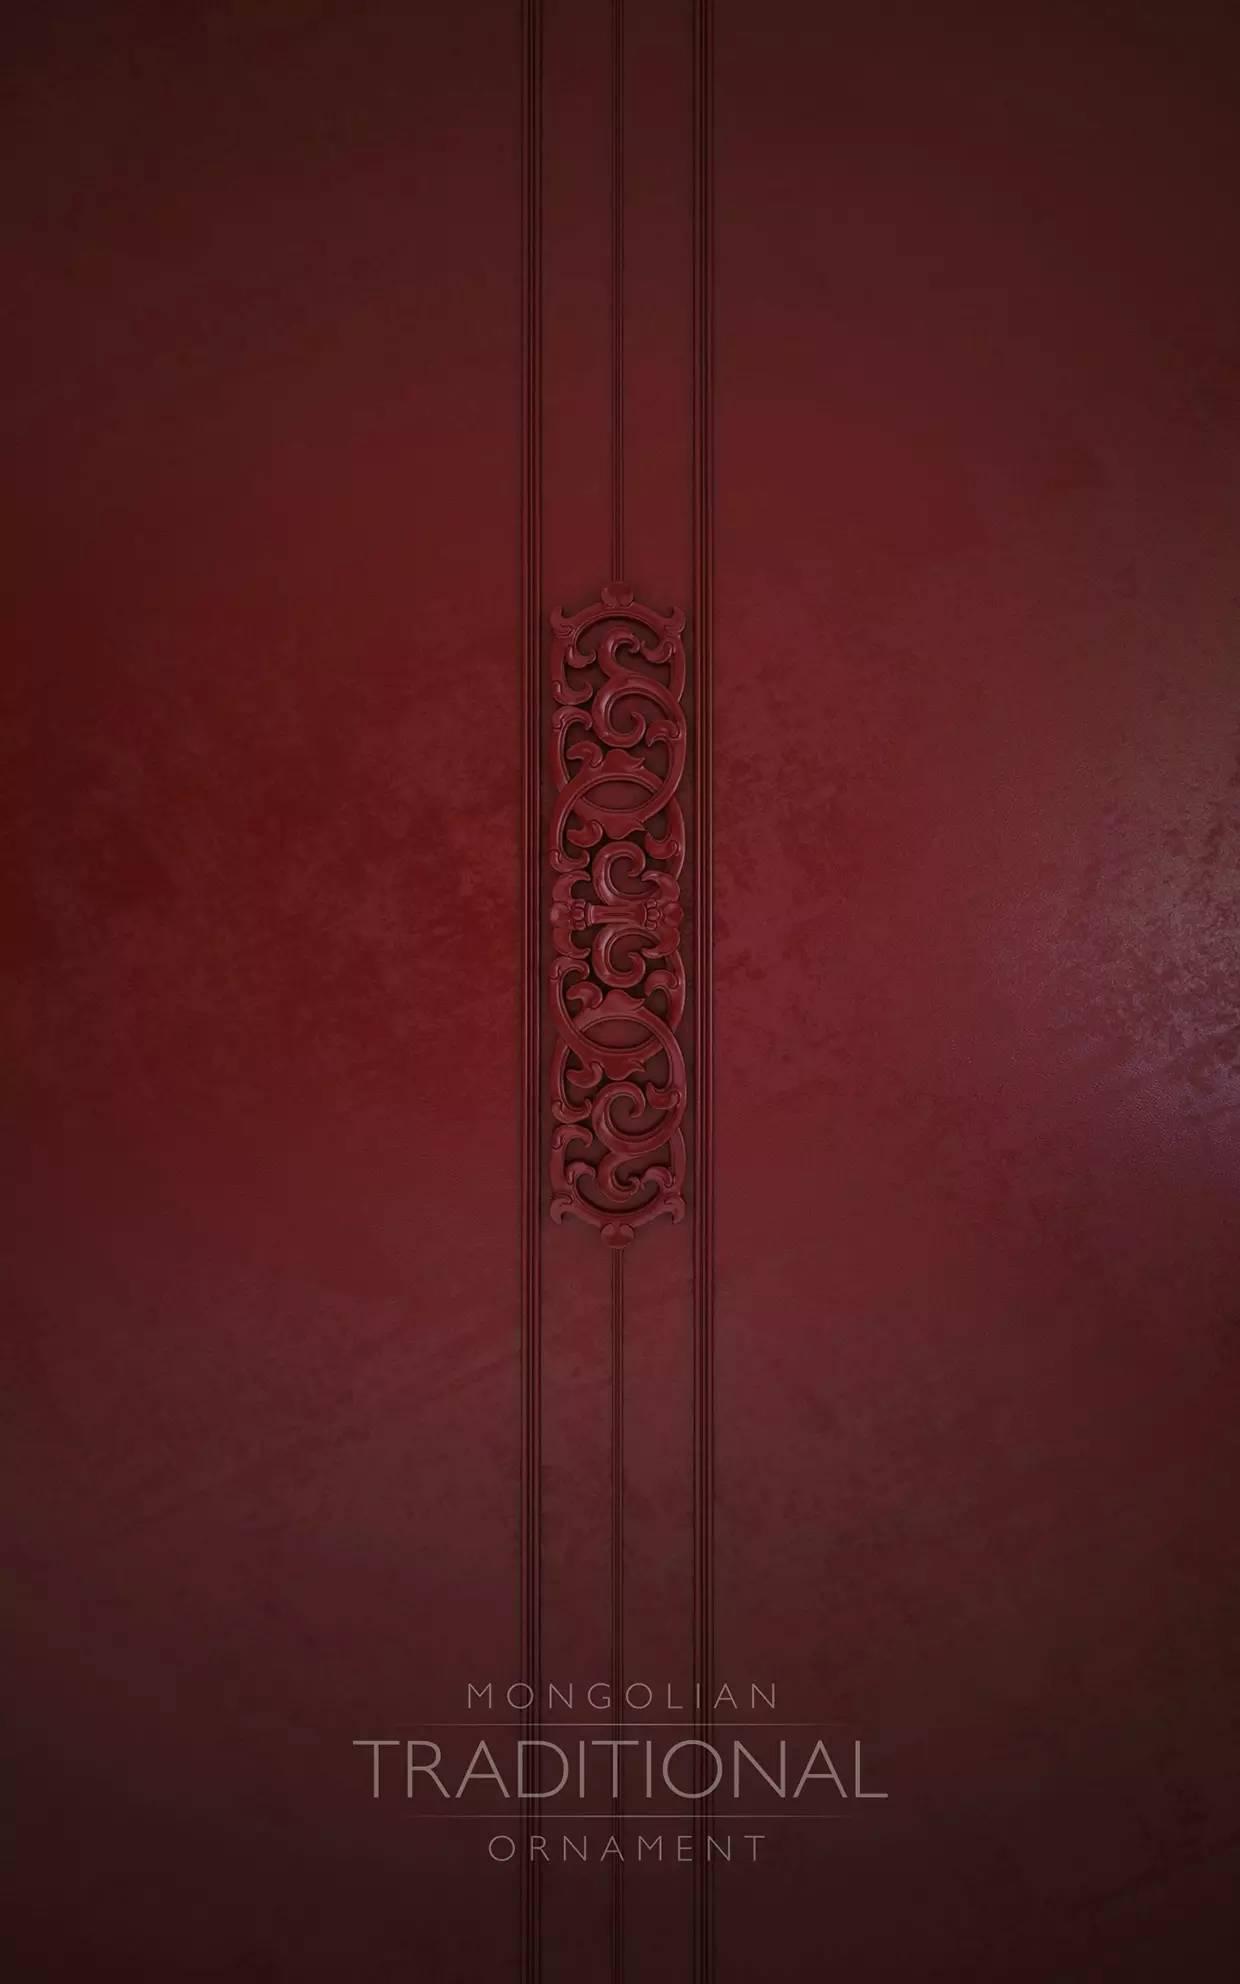 室内设计 蒙族传统装饰(Mongolian Traditional Ornament) 第2张